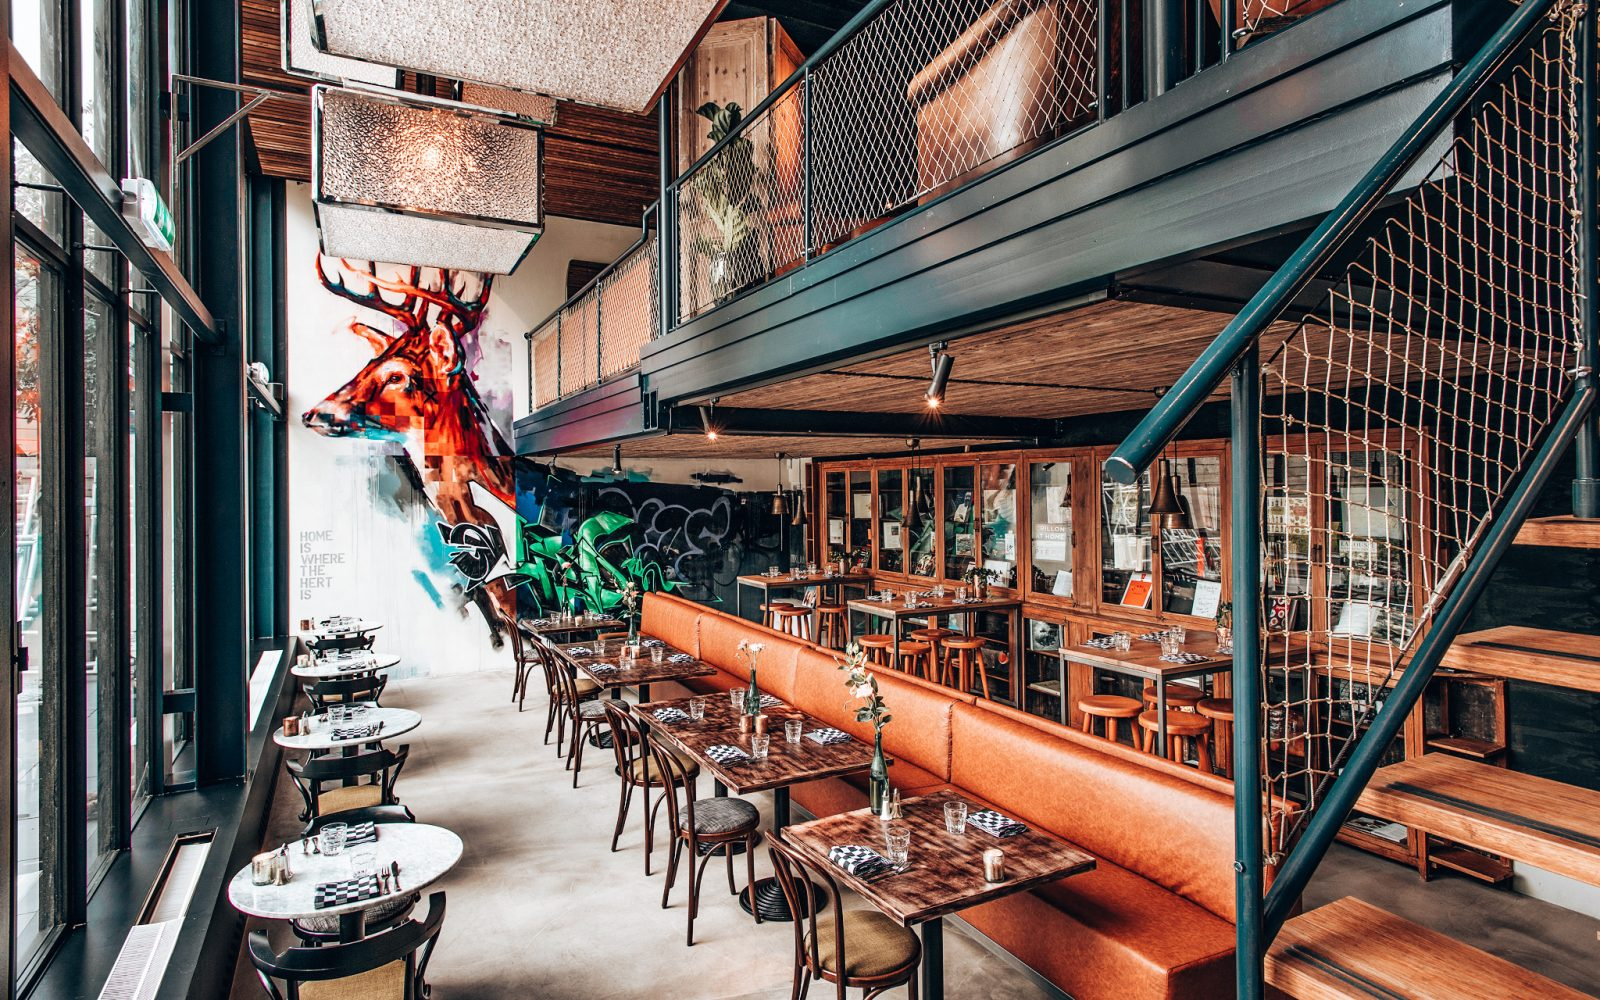 Bar Café Cliché